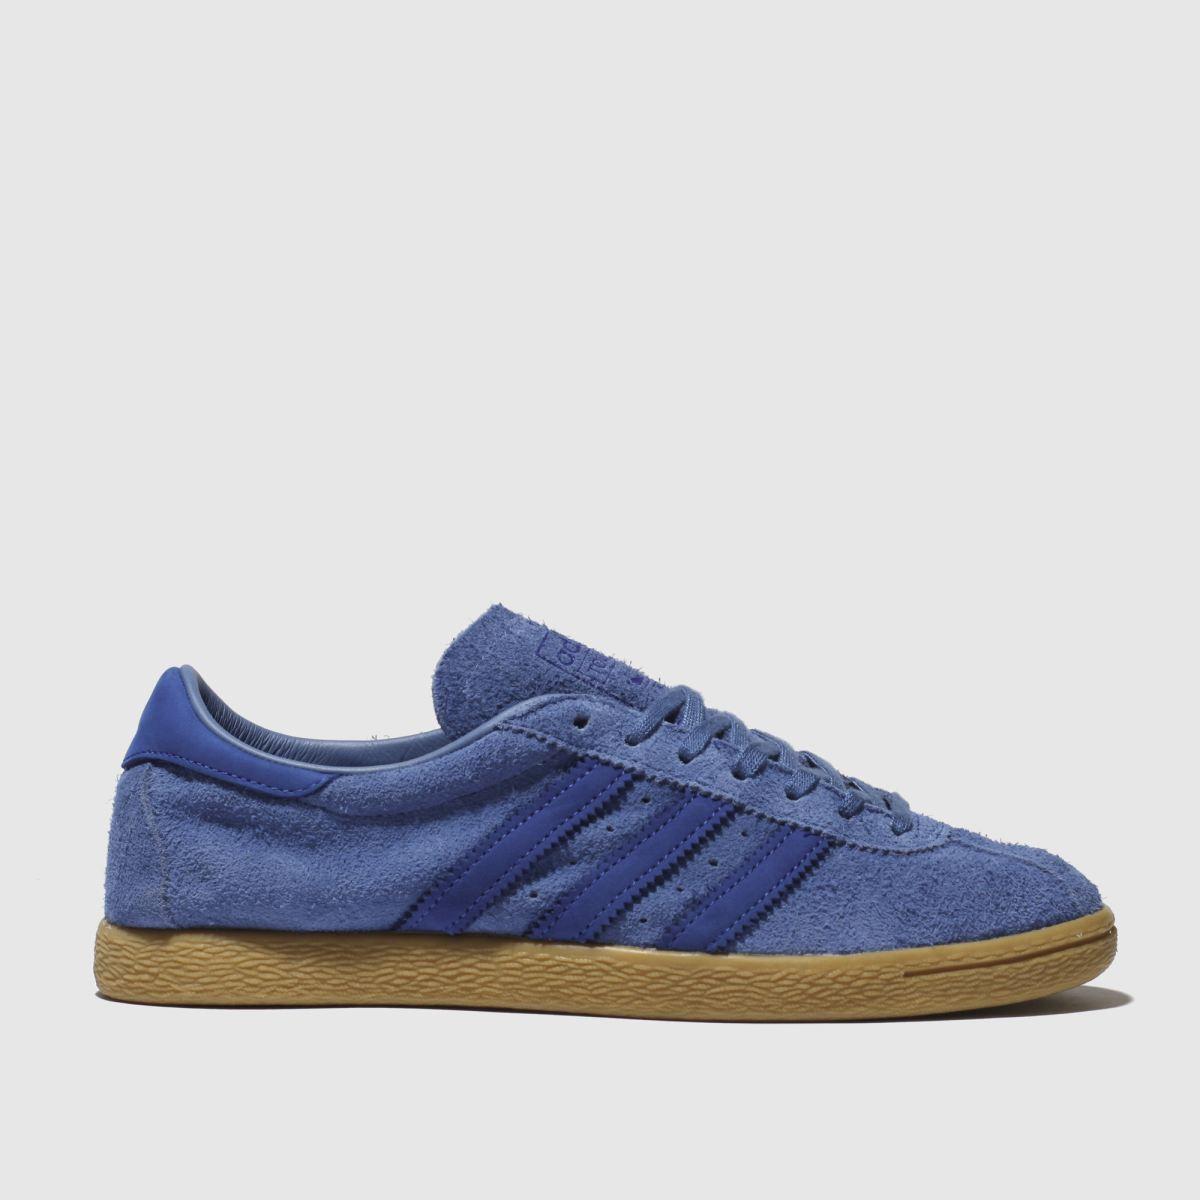 Adidas Blue Tobacco Trainers